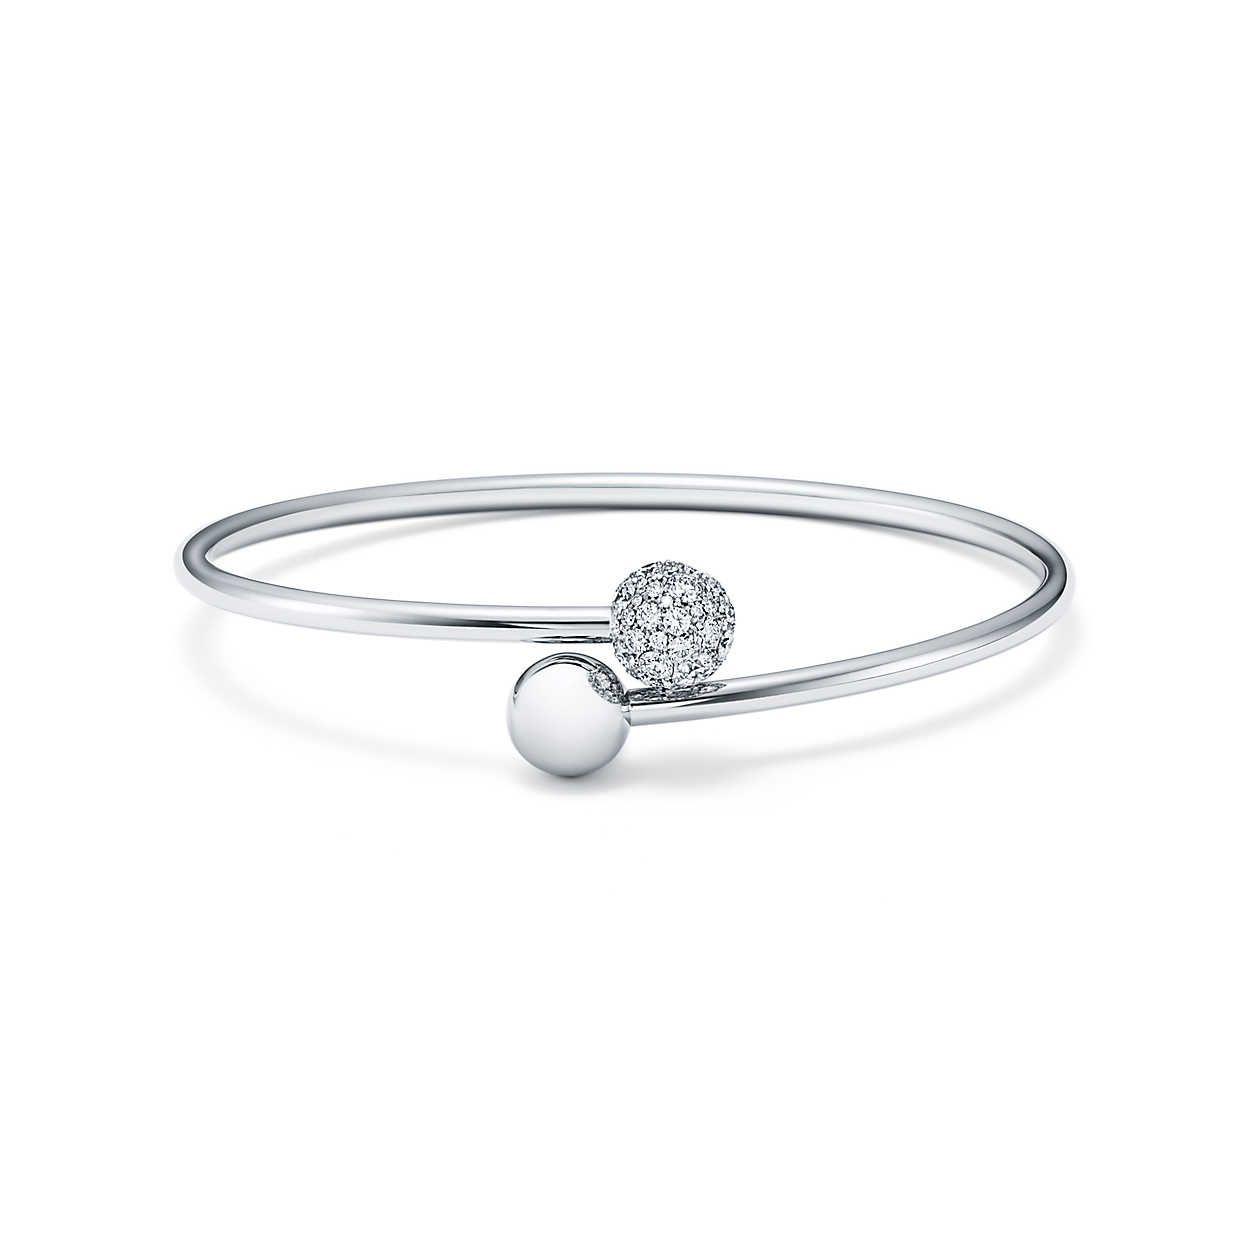 18b0a3f7e Tiffany HardWear ball bypass bracelet in 18k white gold with diamonds,  medium. | Tiffany & Co.